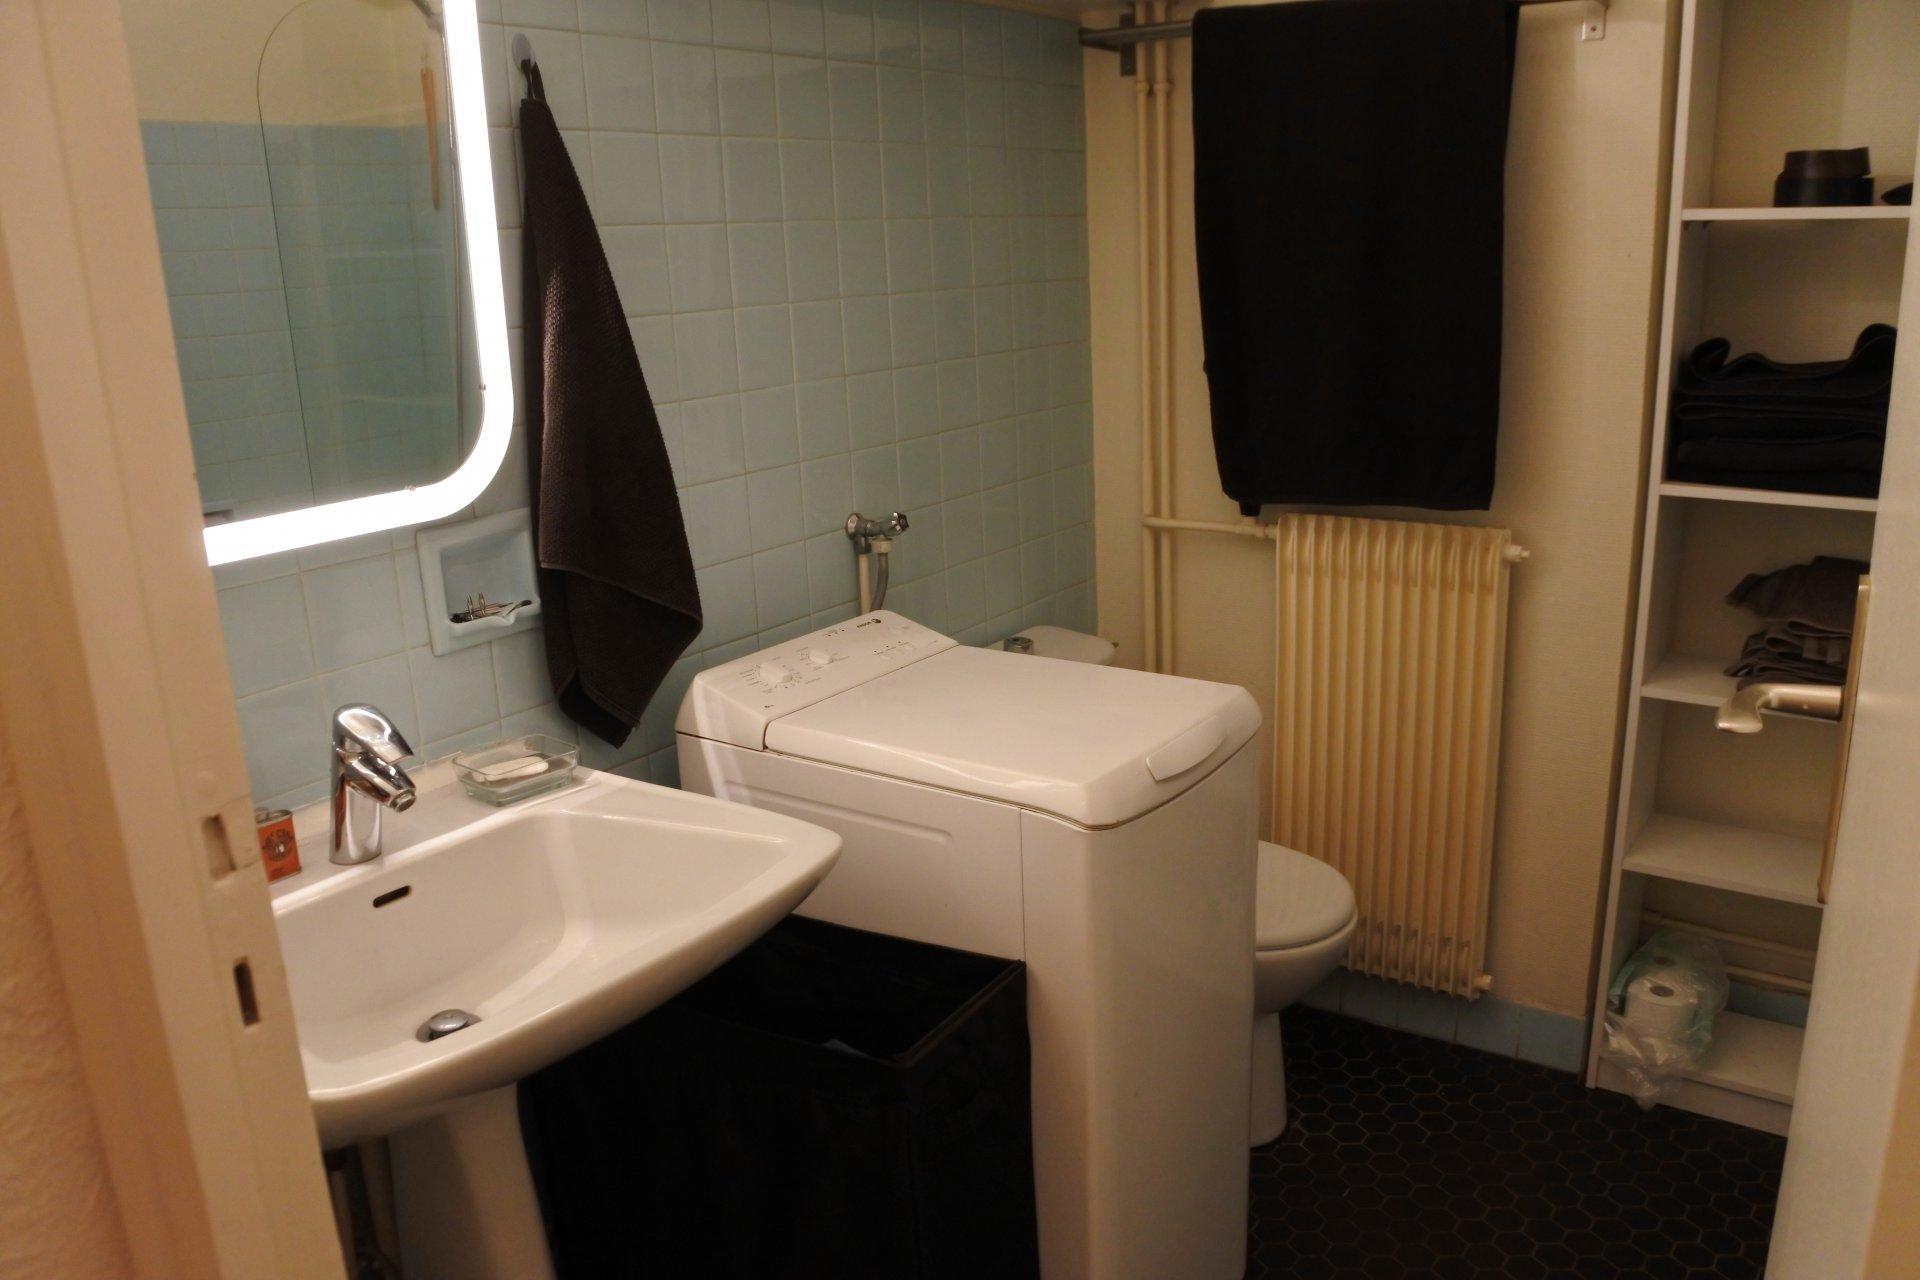 Location Appartement - Saint-Germain-en-Laye Alsace